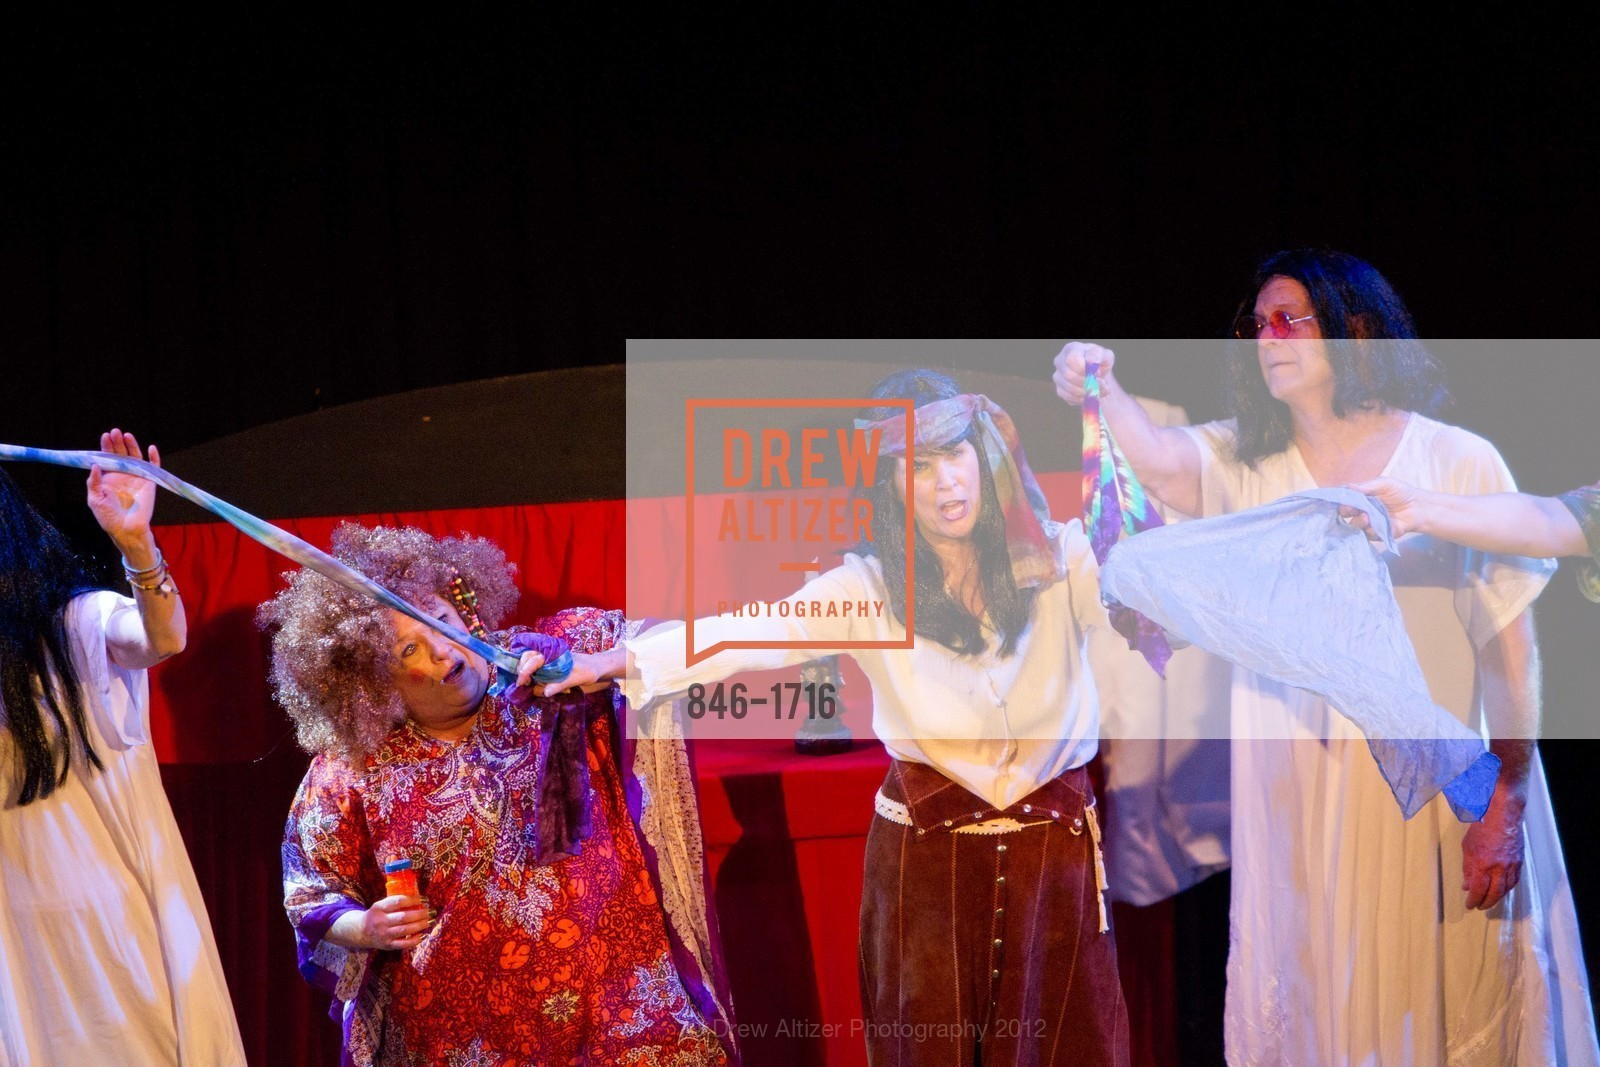 Performance, Photo #846-1716